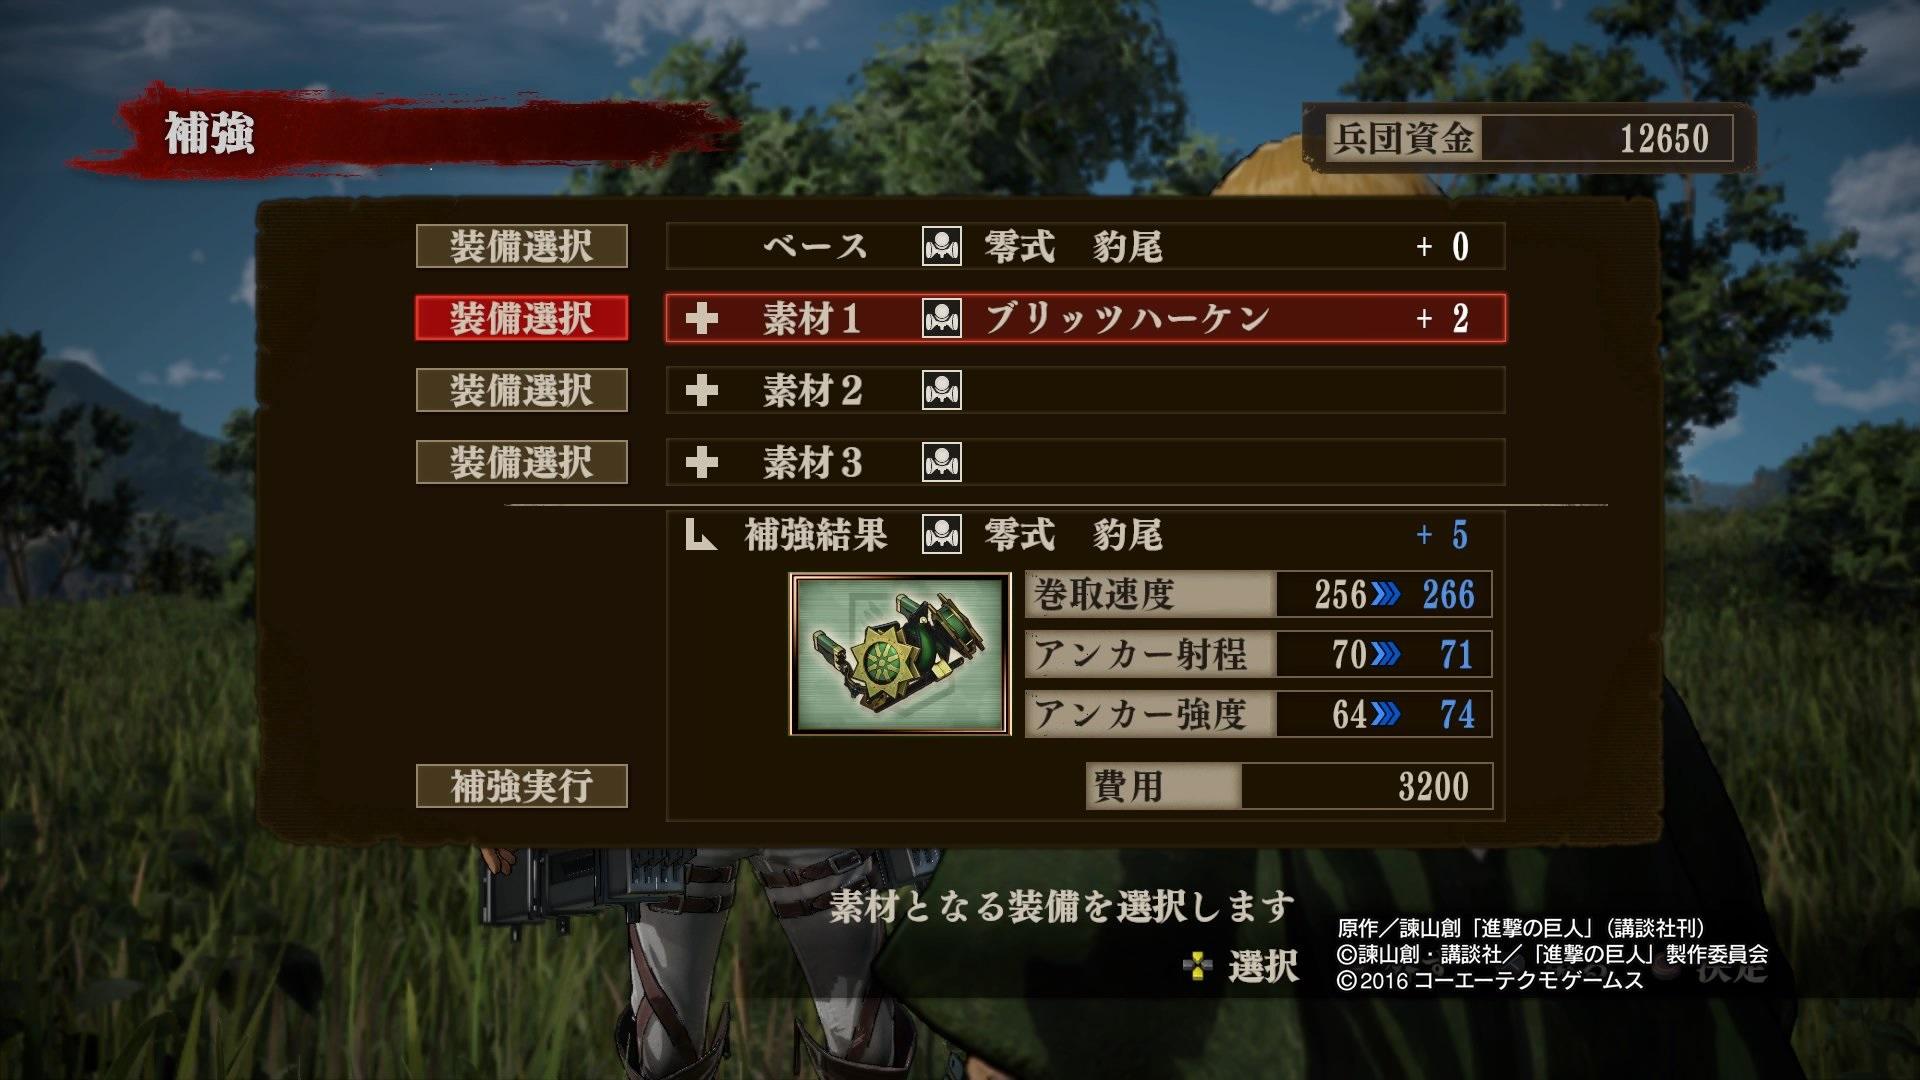 AttackonTitan PS4 Test 004